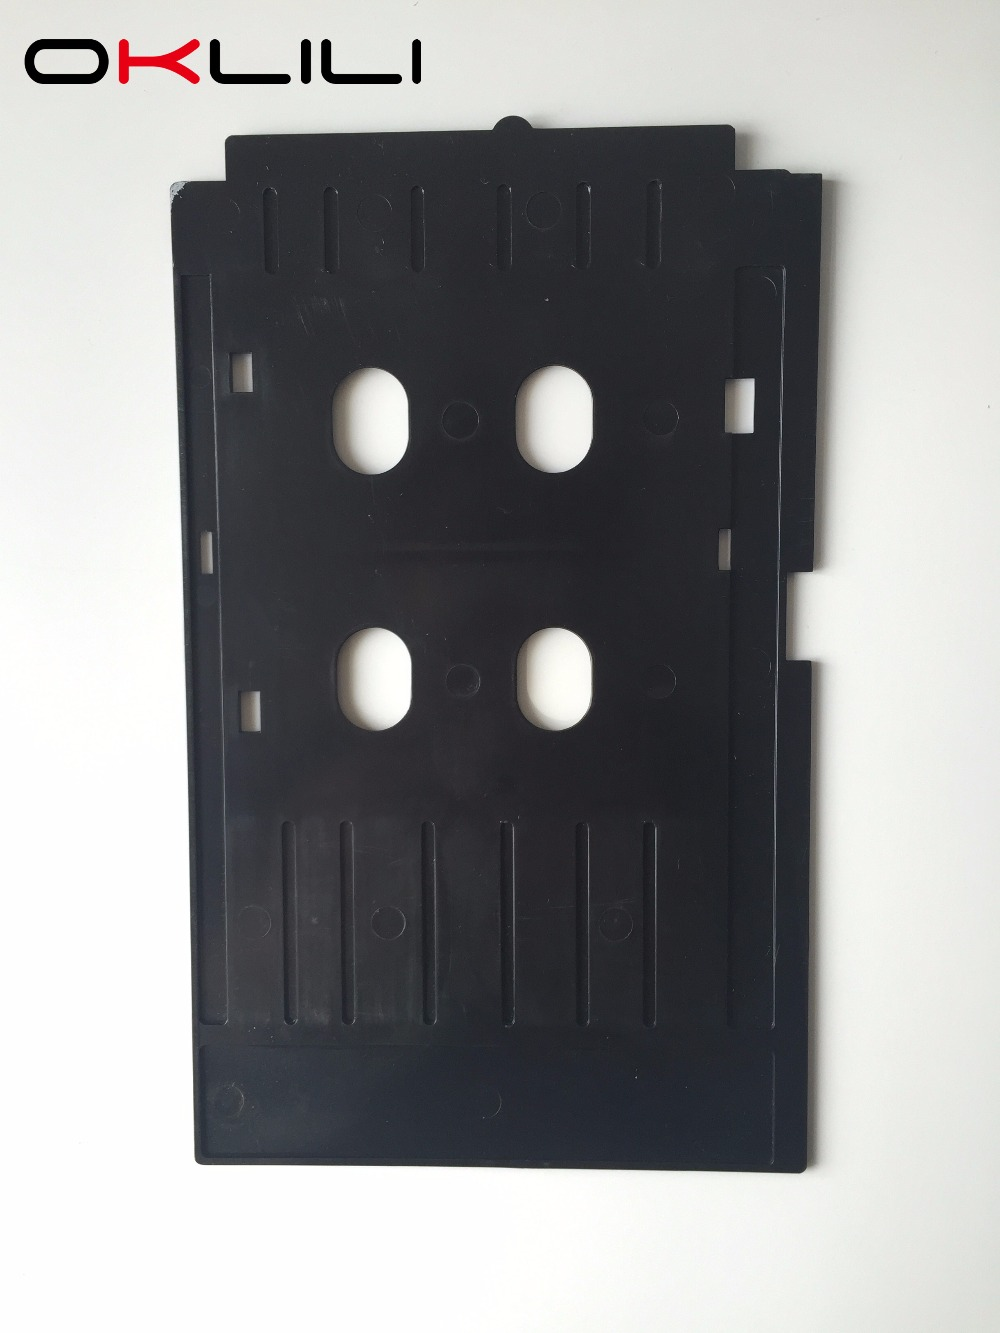 Epson R260 R265 R270 R280 R290 R380 R390 RX680 T50 T60 A50 P50 L800 - Ofis elektronikası - Fotoqrafiya 3